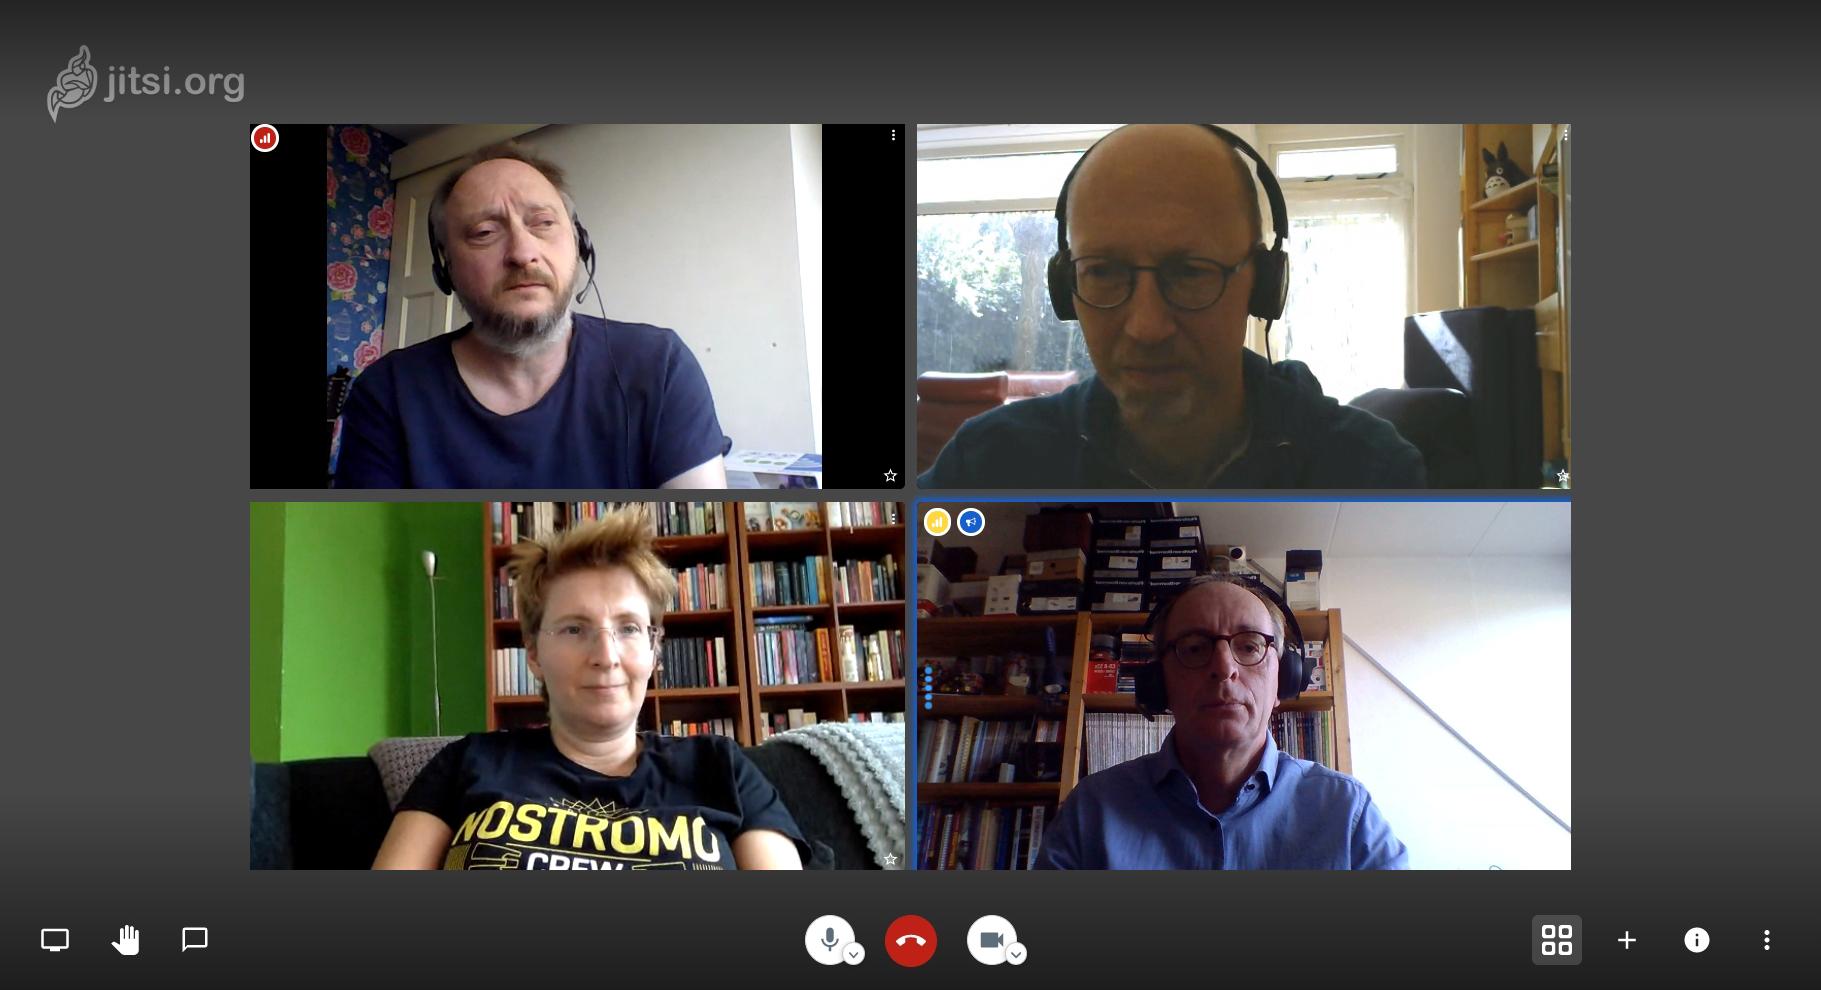 Jitsi server videoconferentie op eigen server